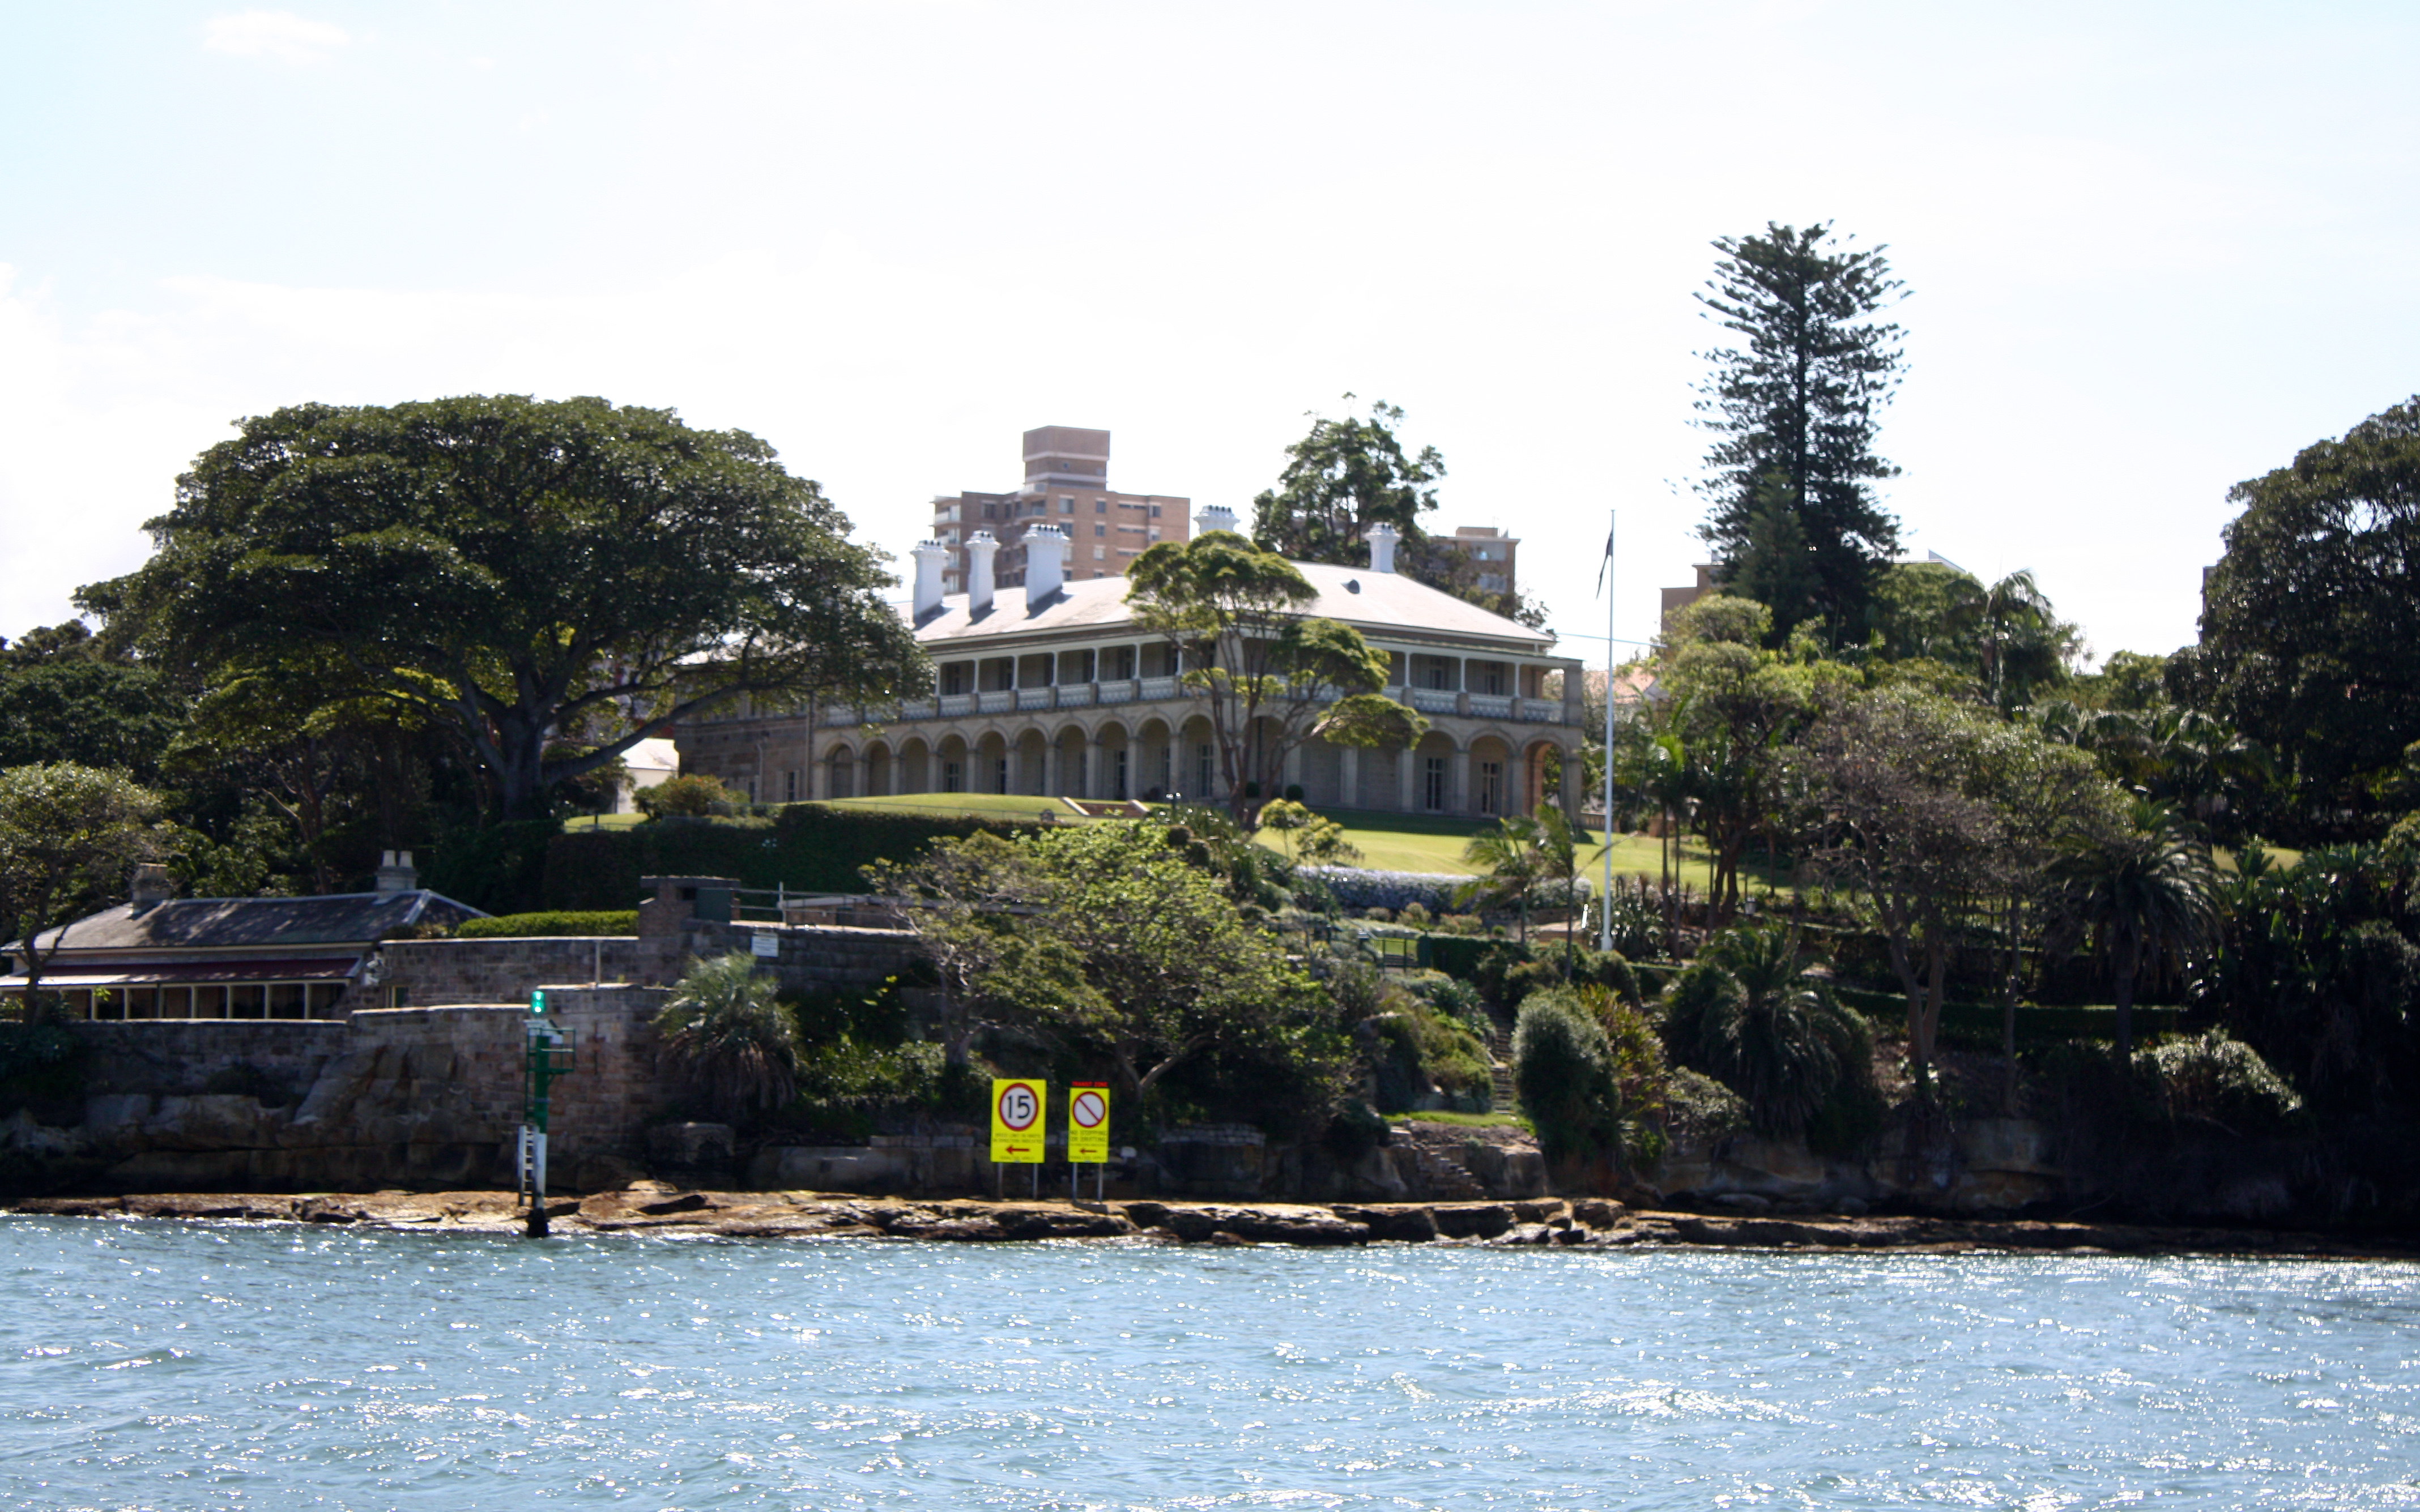 51 dates in Sydney